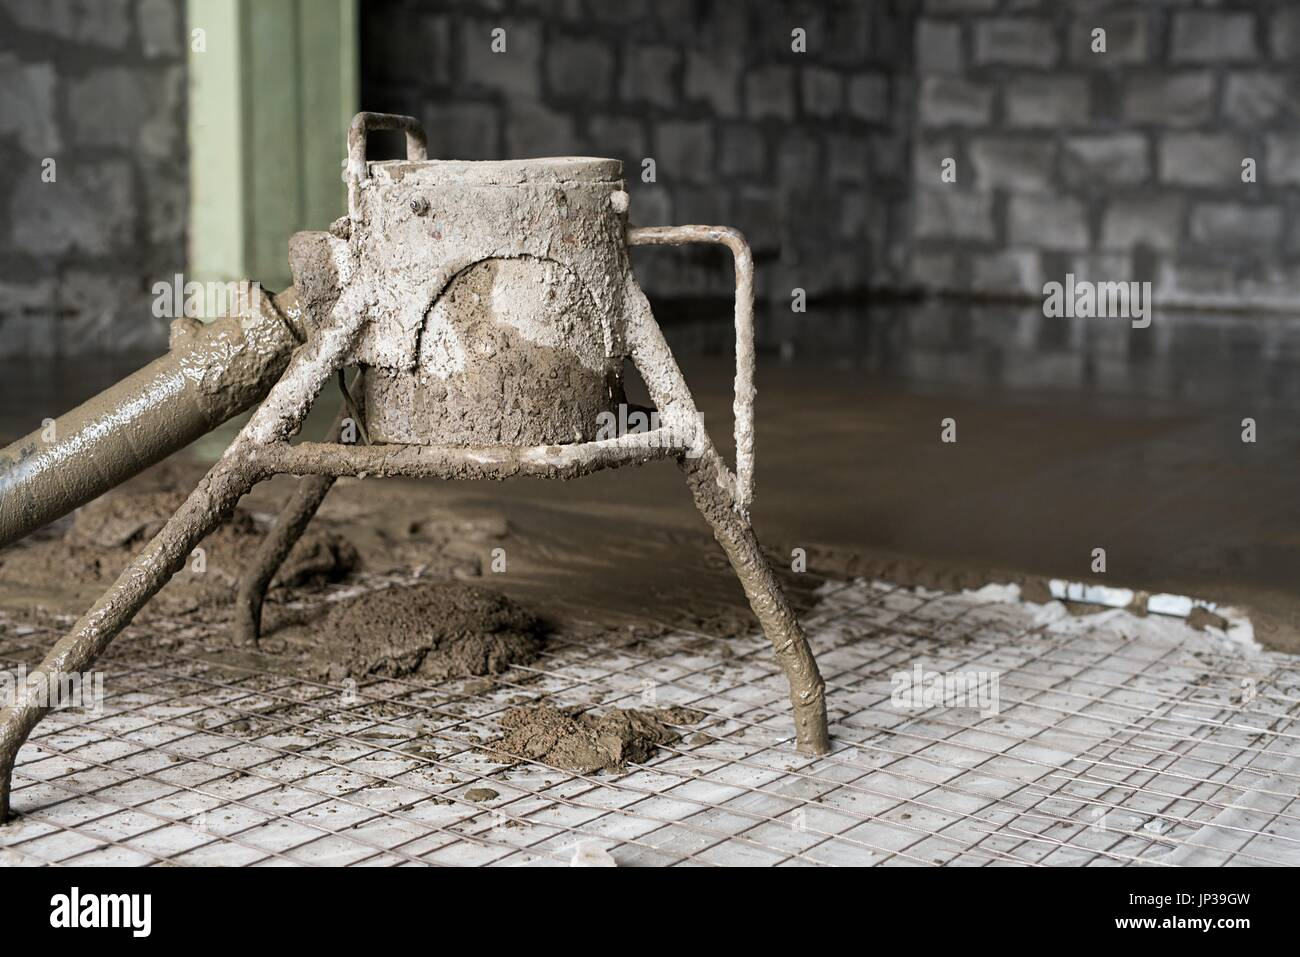 screed floor stockfotos screed floor bilder alamy. Black Bedroom Furniture Sets. Home Design Ideas